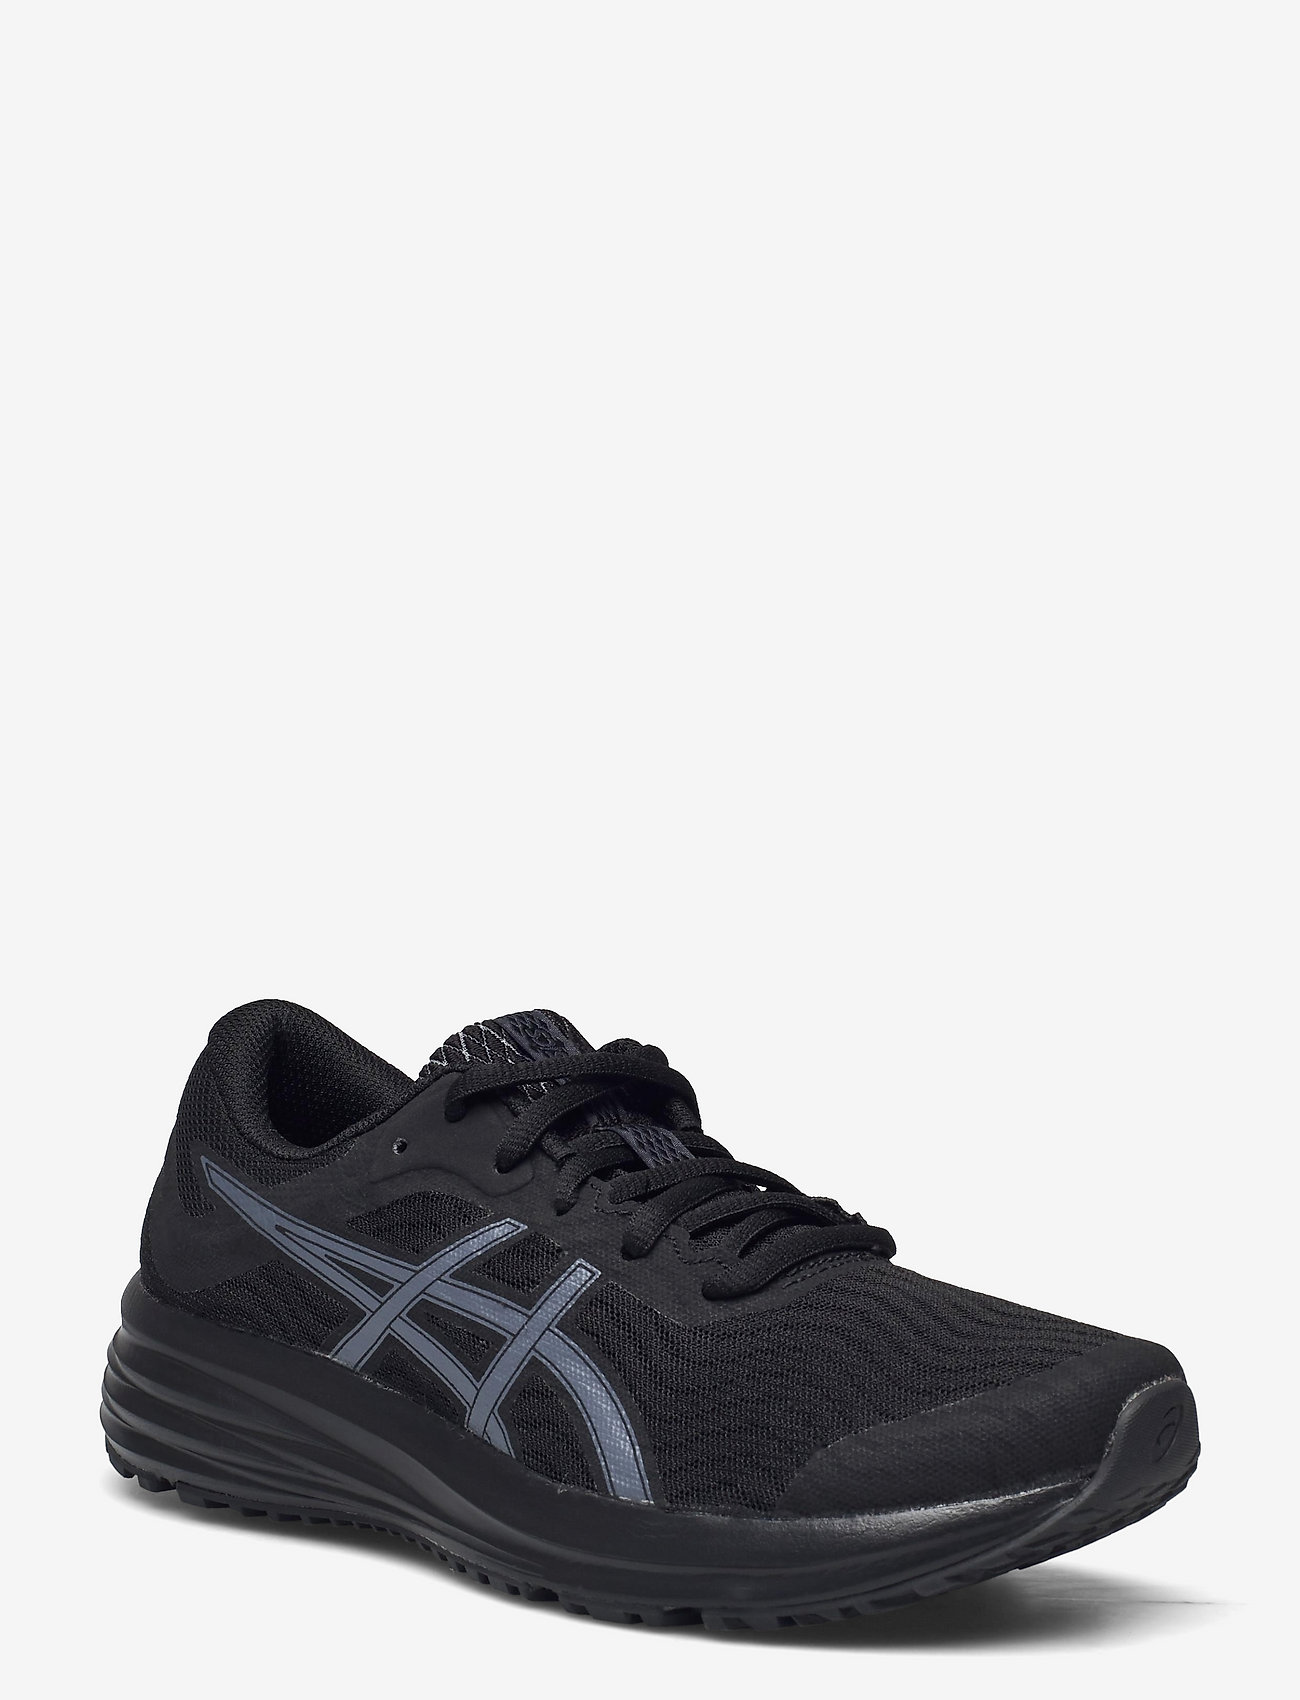 Asics - PATRIOT 12 - running shoes - black/carrier grey - 0